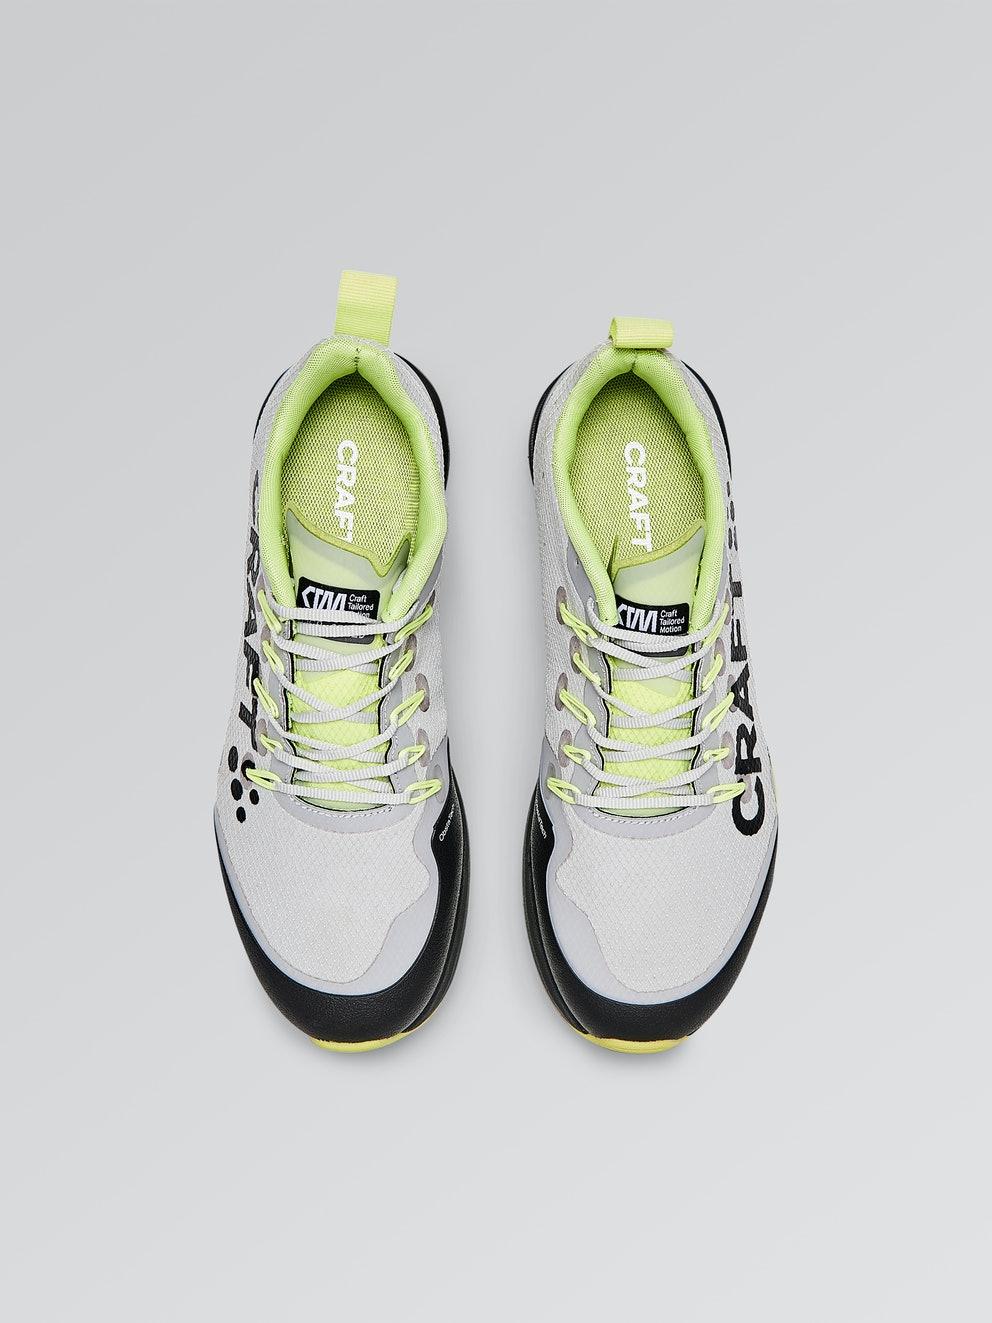 craft ocr ctm speed chaussure trail 5